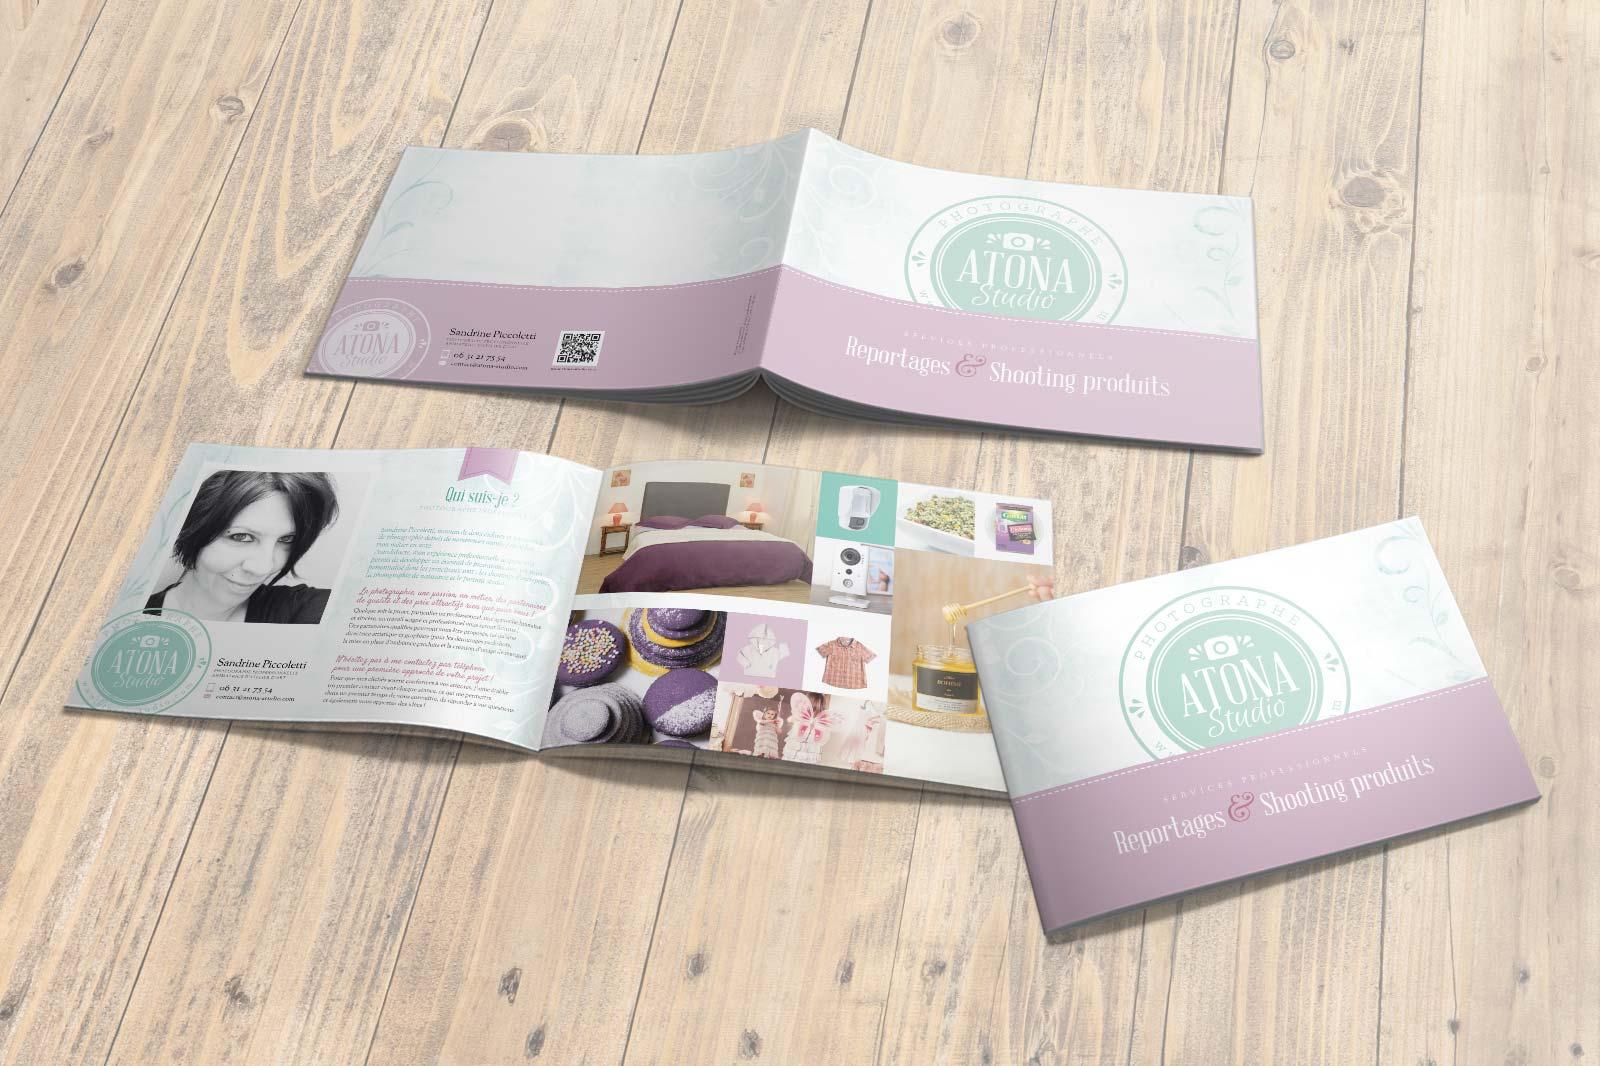 cr ations atona studio graphiste webdesigner da chartres orl ans paris nekosign priscilla. Black Bedroom Furniture Sets. Home Design Ideas